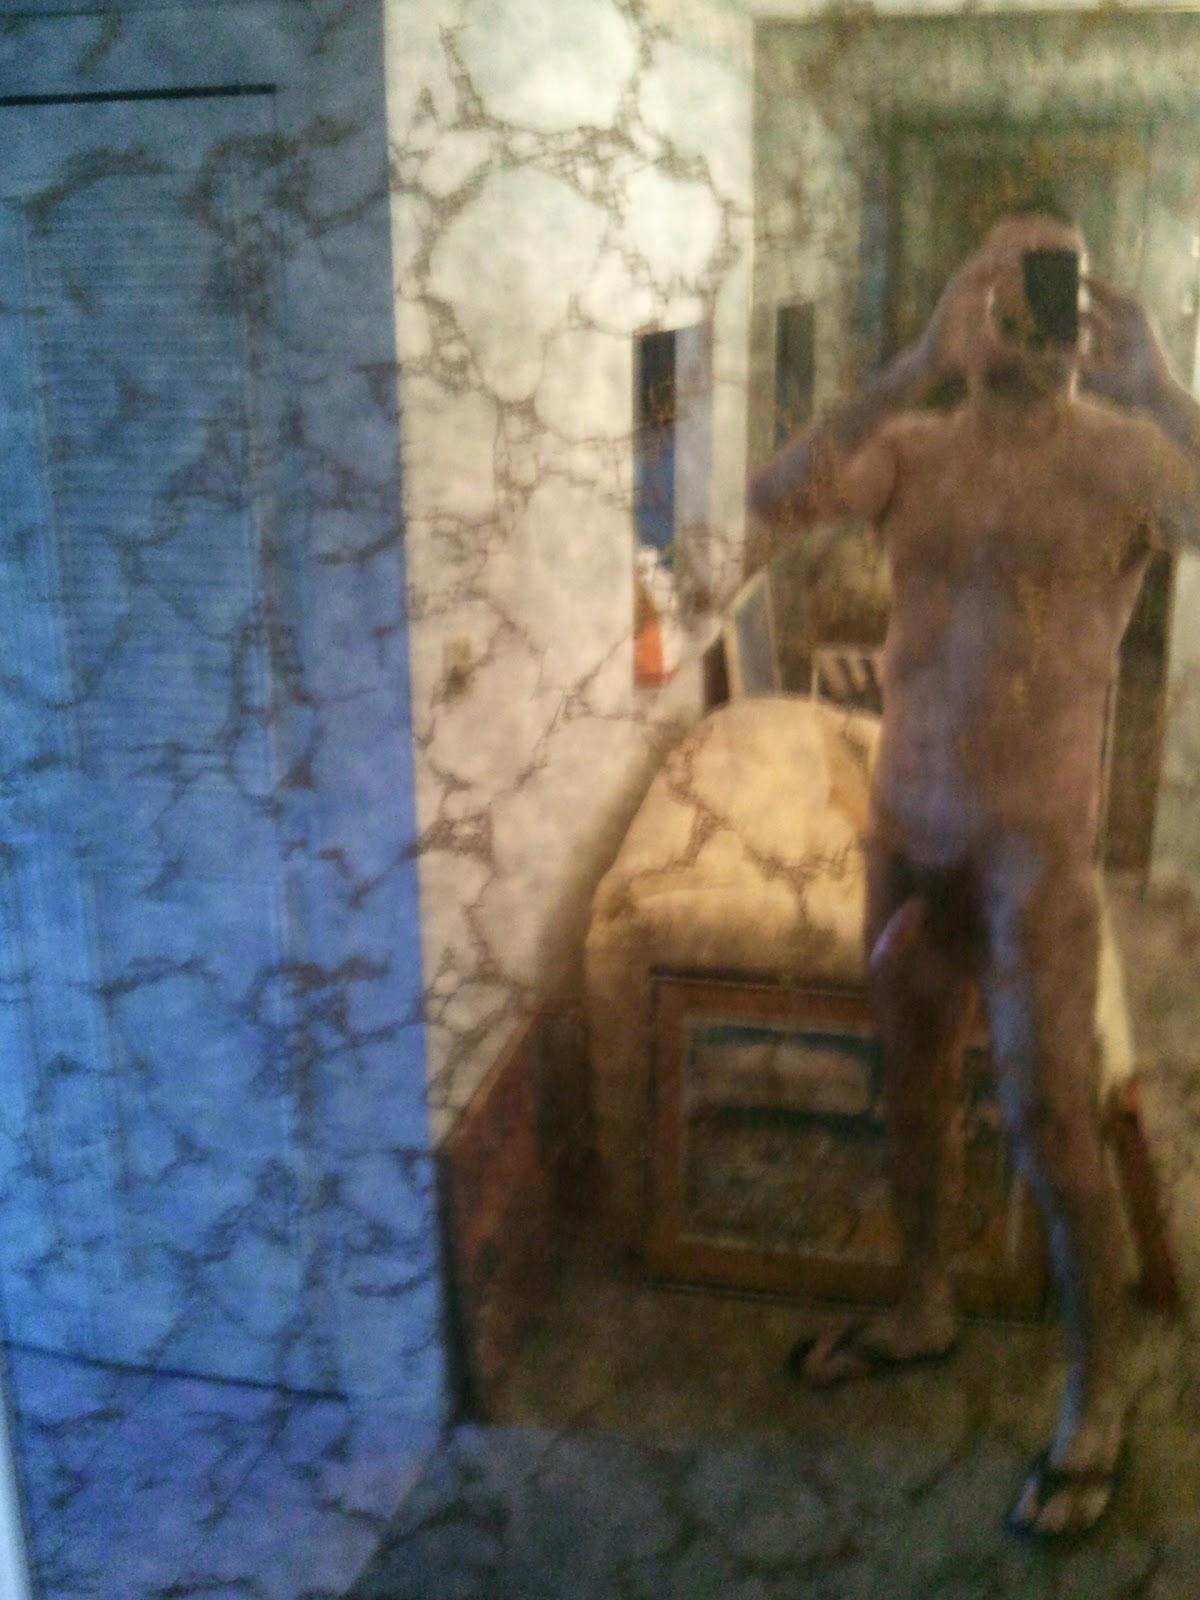 NUDE%2BA%2B12%2B12%2B10 Sejo's blog straight male nude gay male